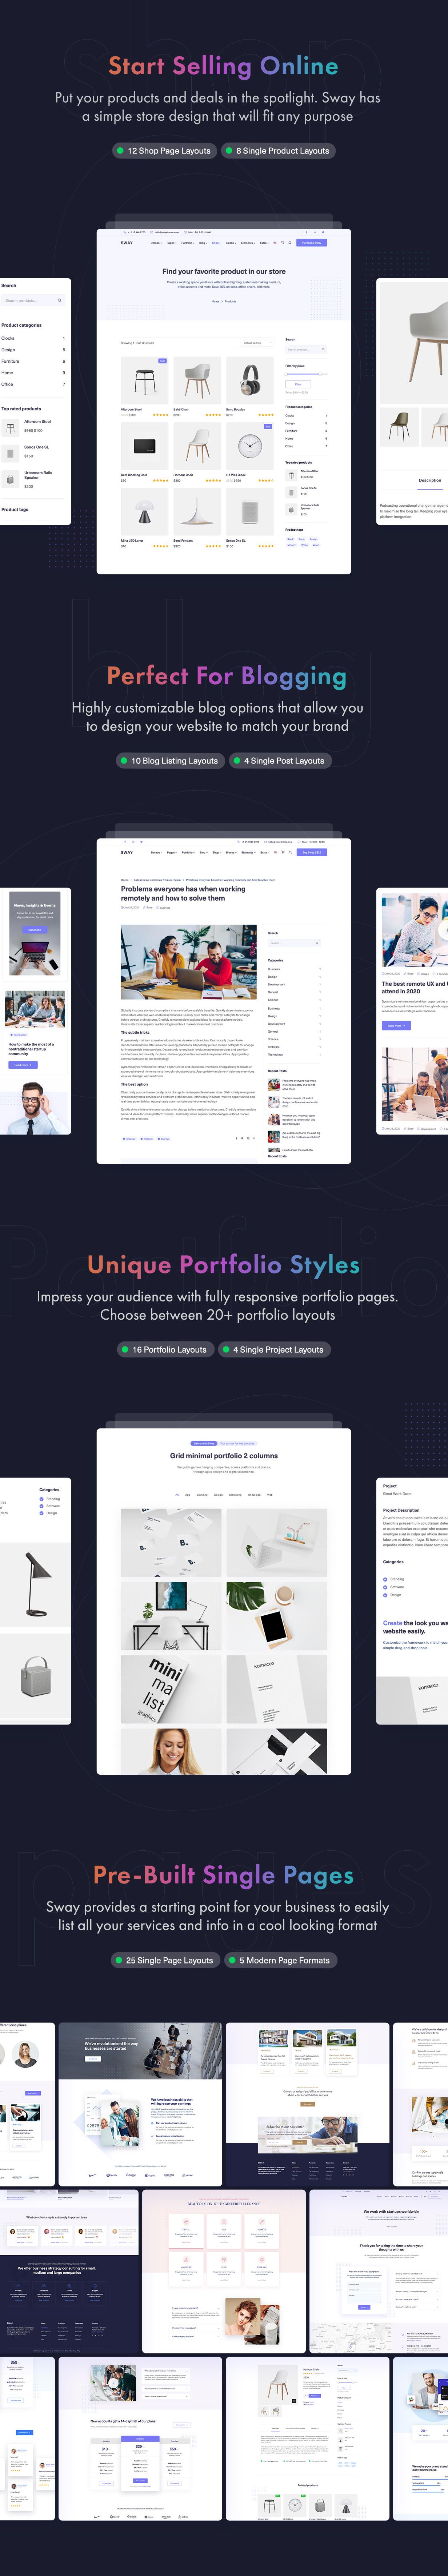 Sway - Multi-Purpose WordPress Theme with Page Builder - 10